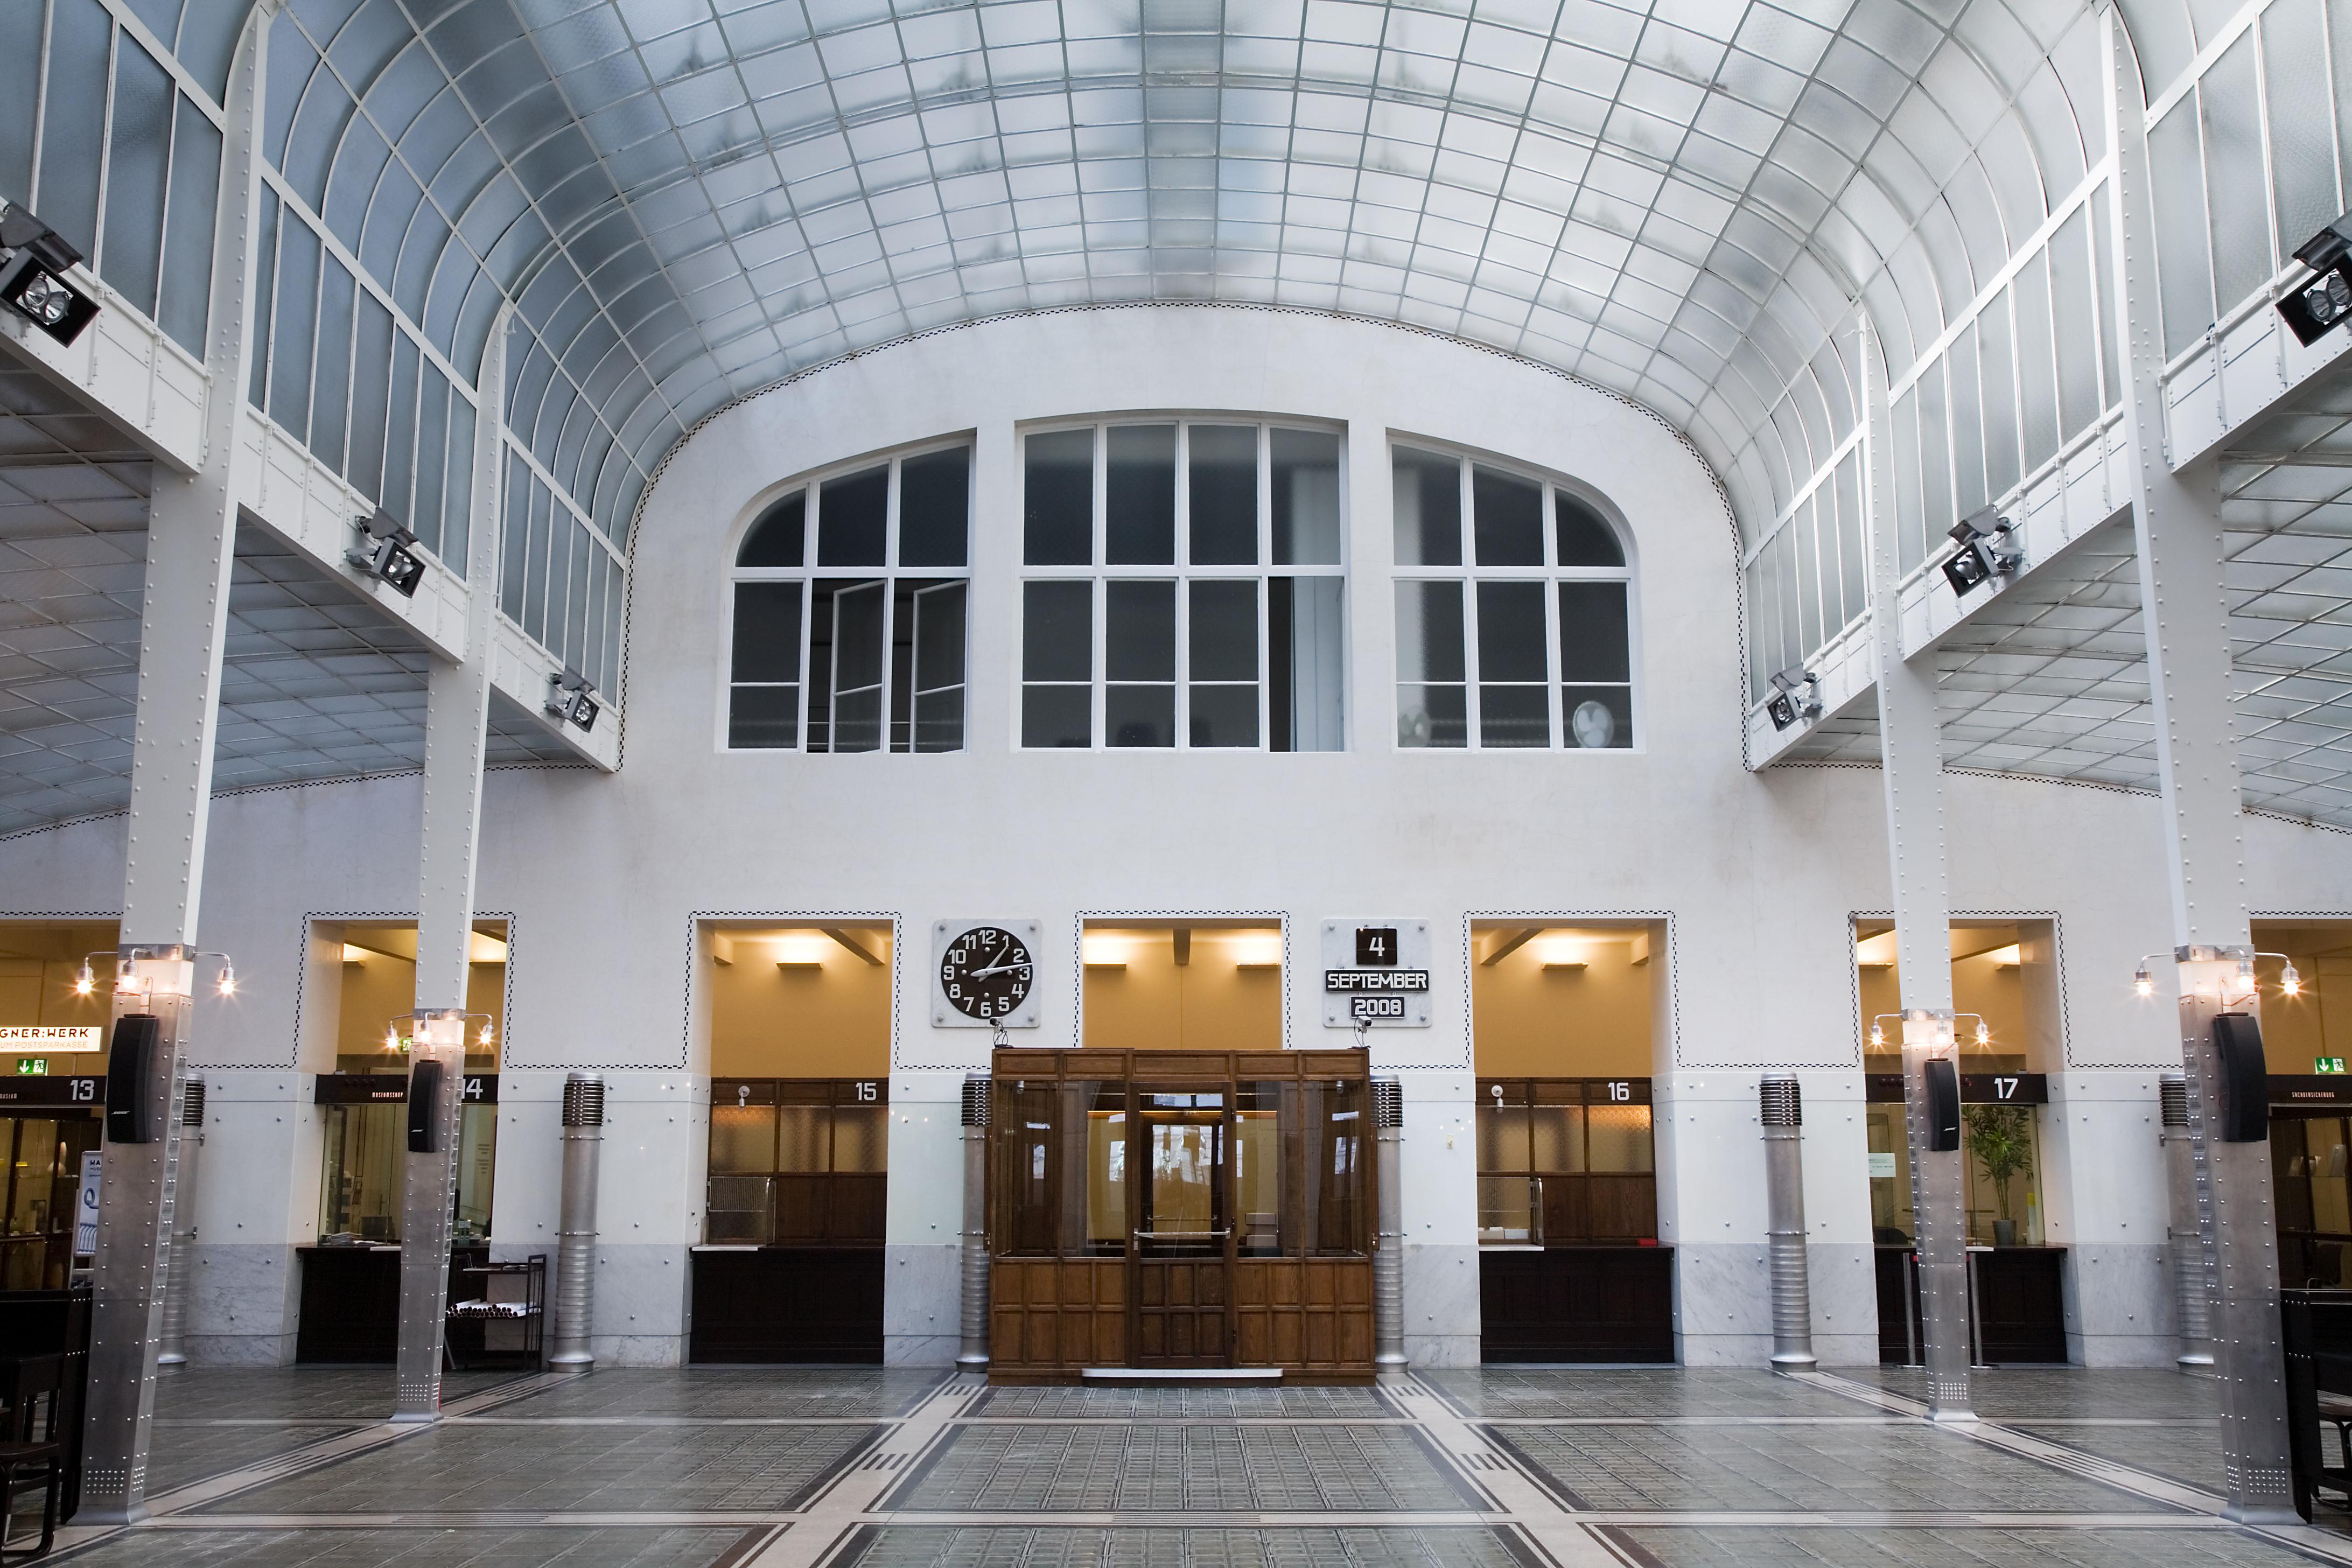 File:Vienna - PSK Otto Wagner's Postsparkasse - 5983.jpg ...